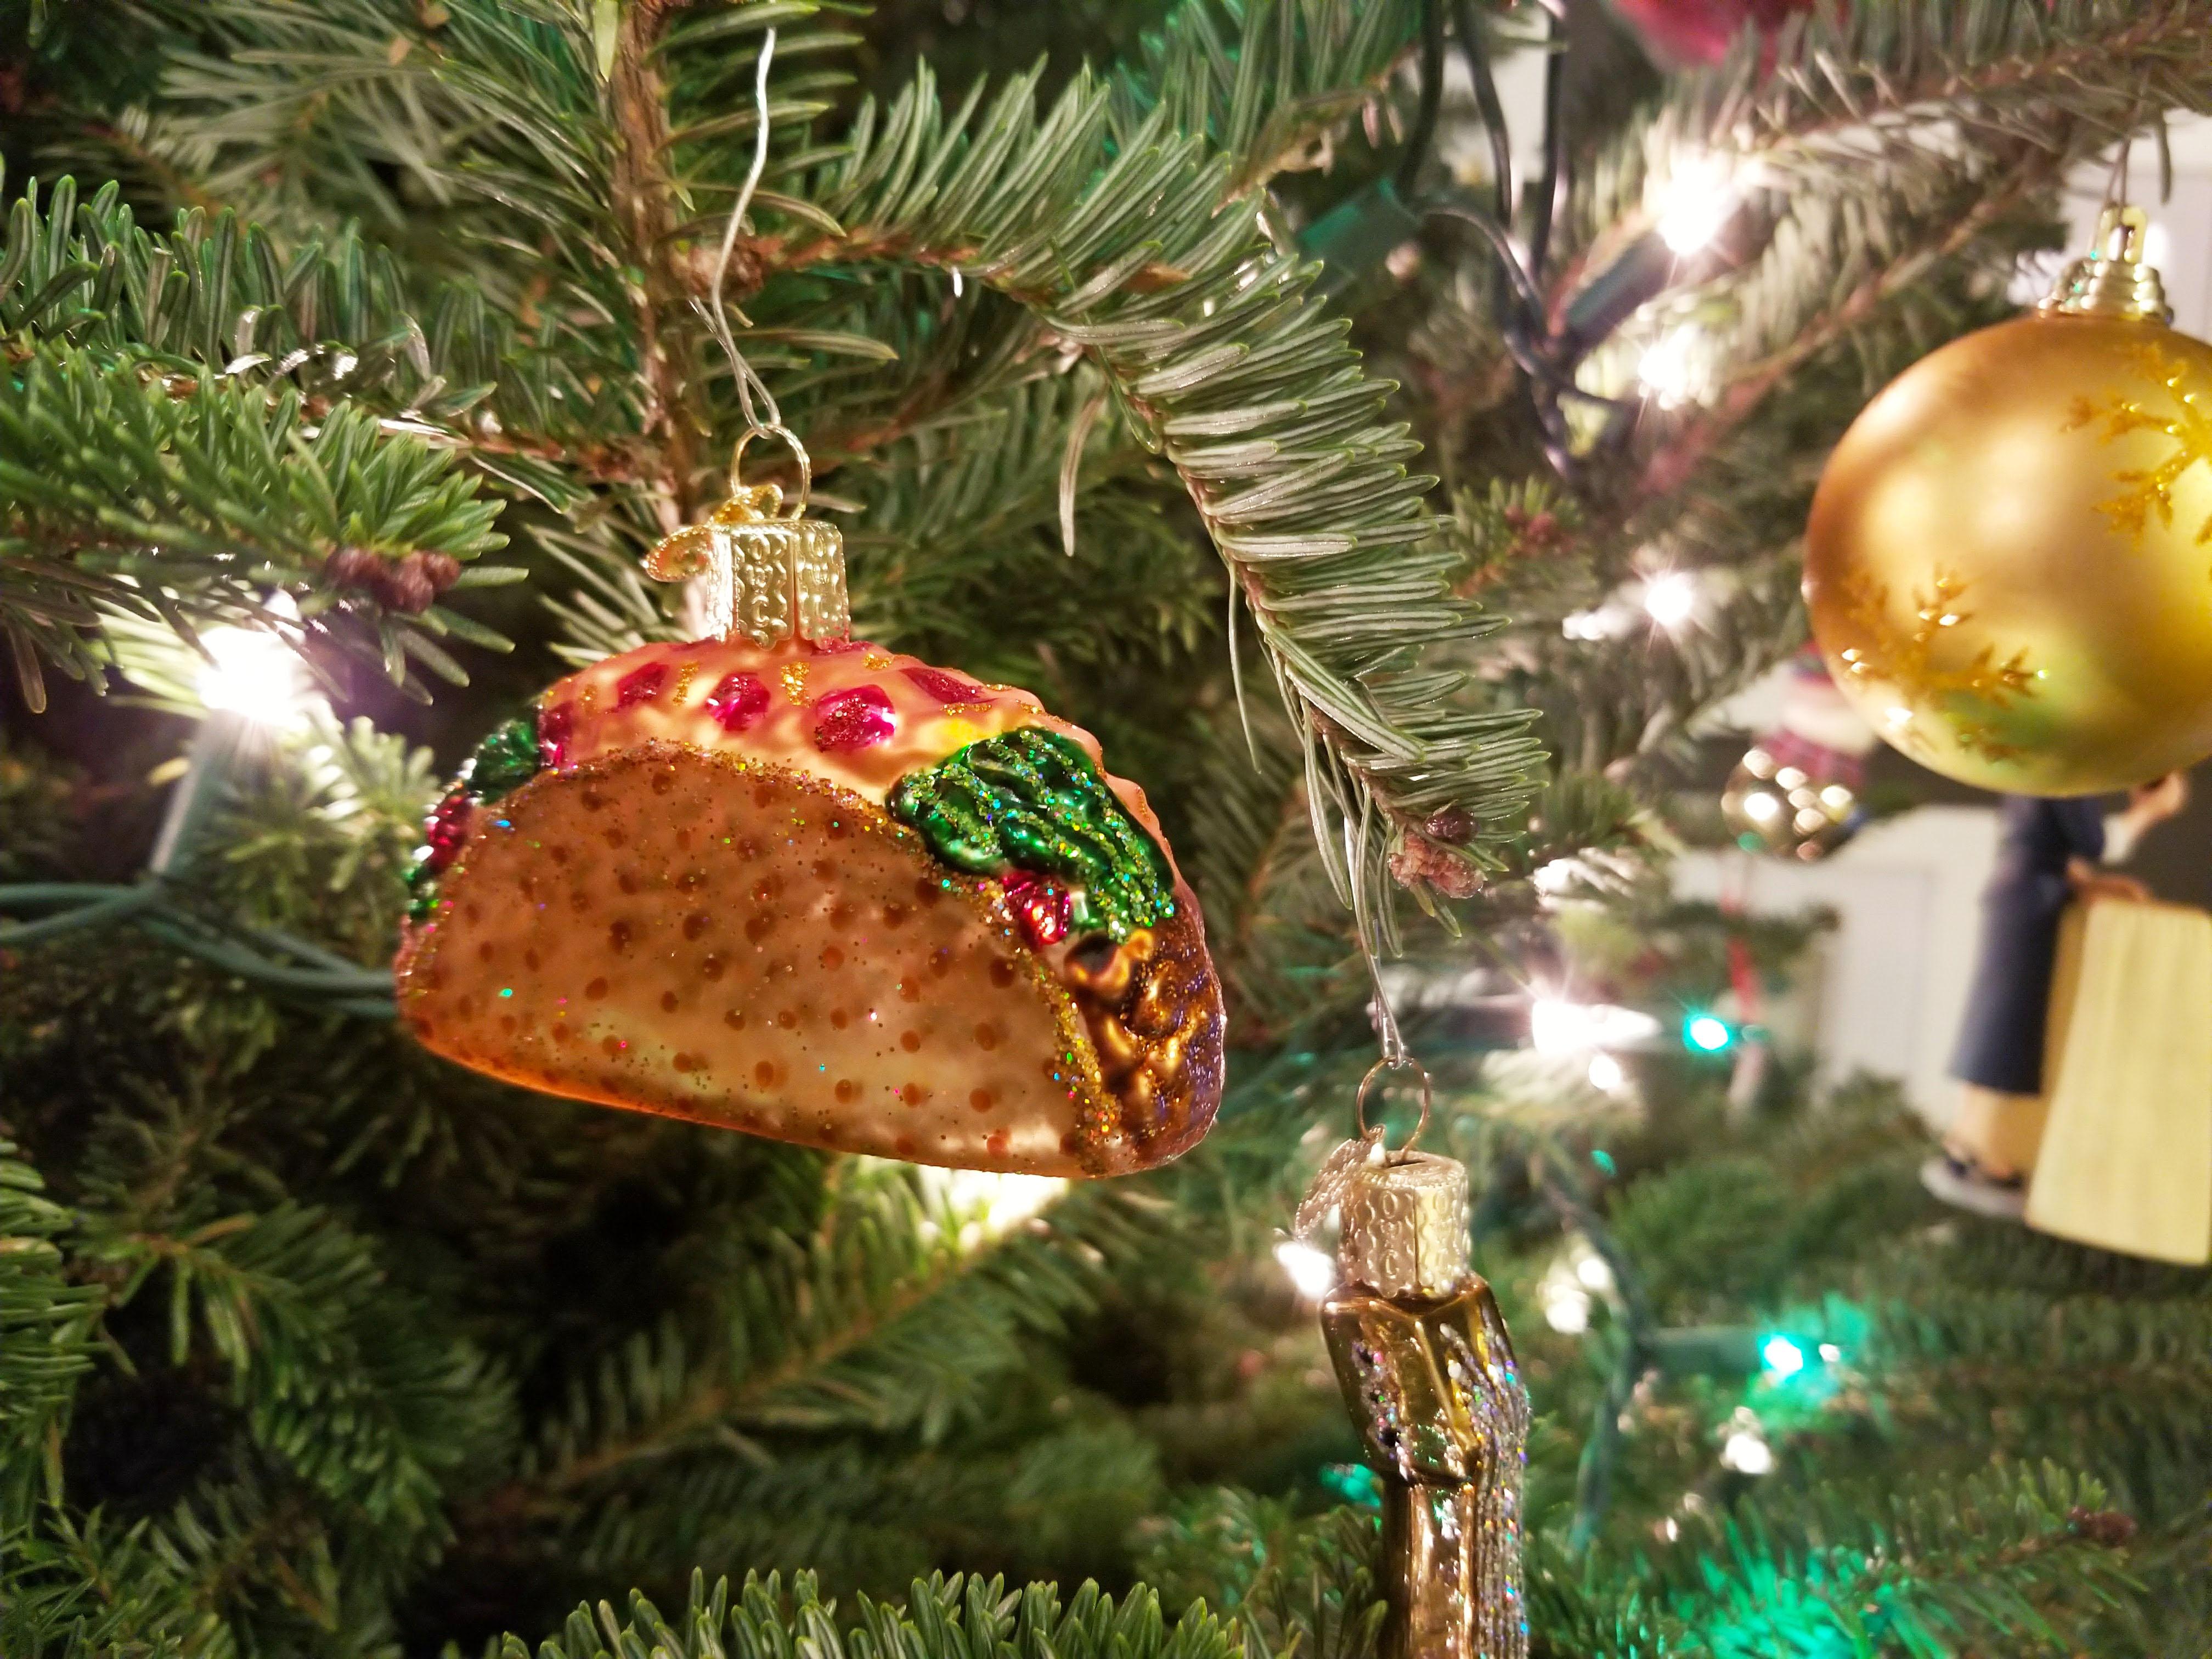 foodie christmas gift ideas 2017